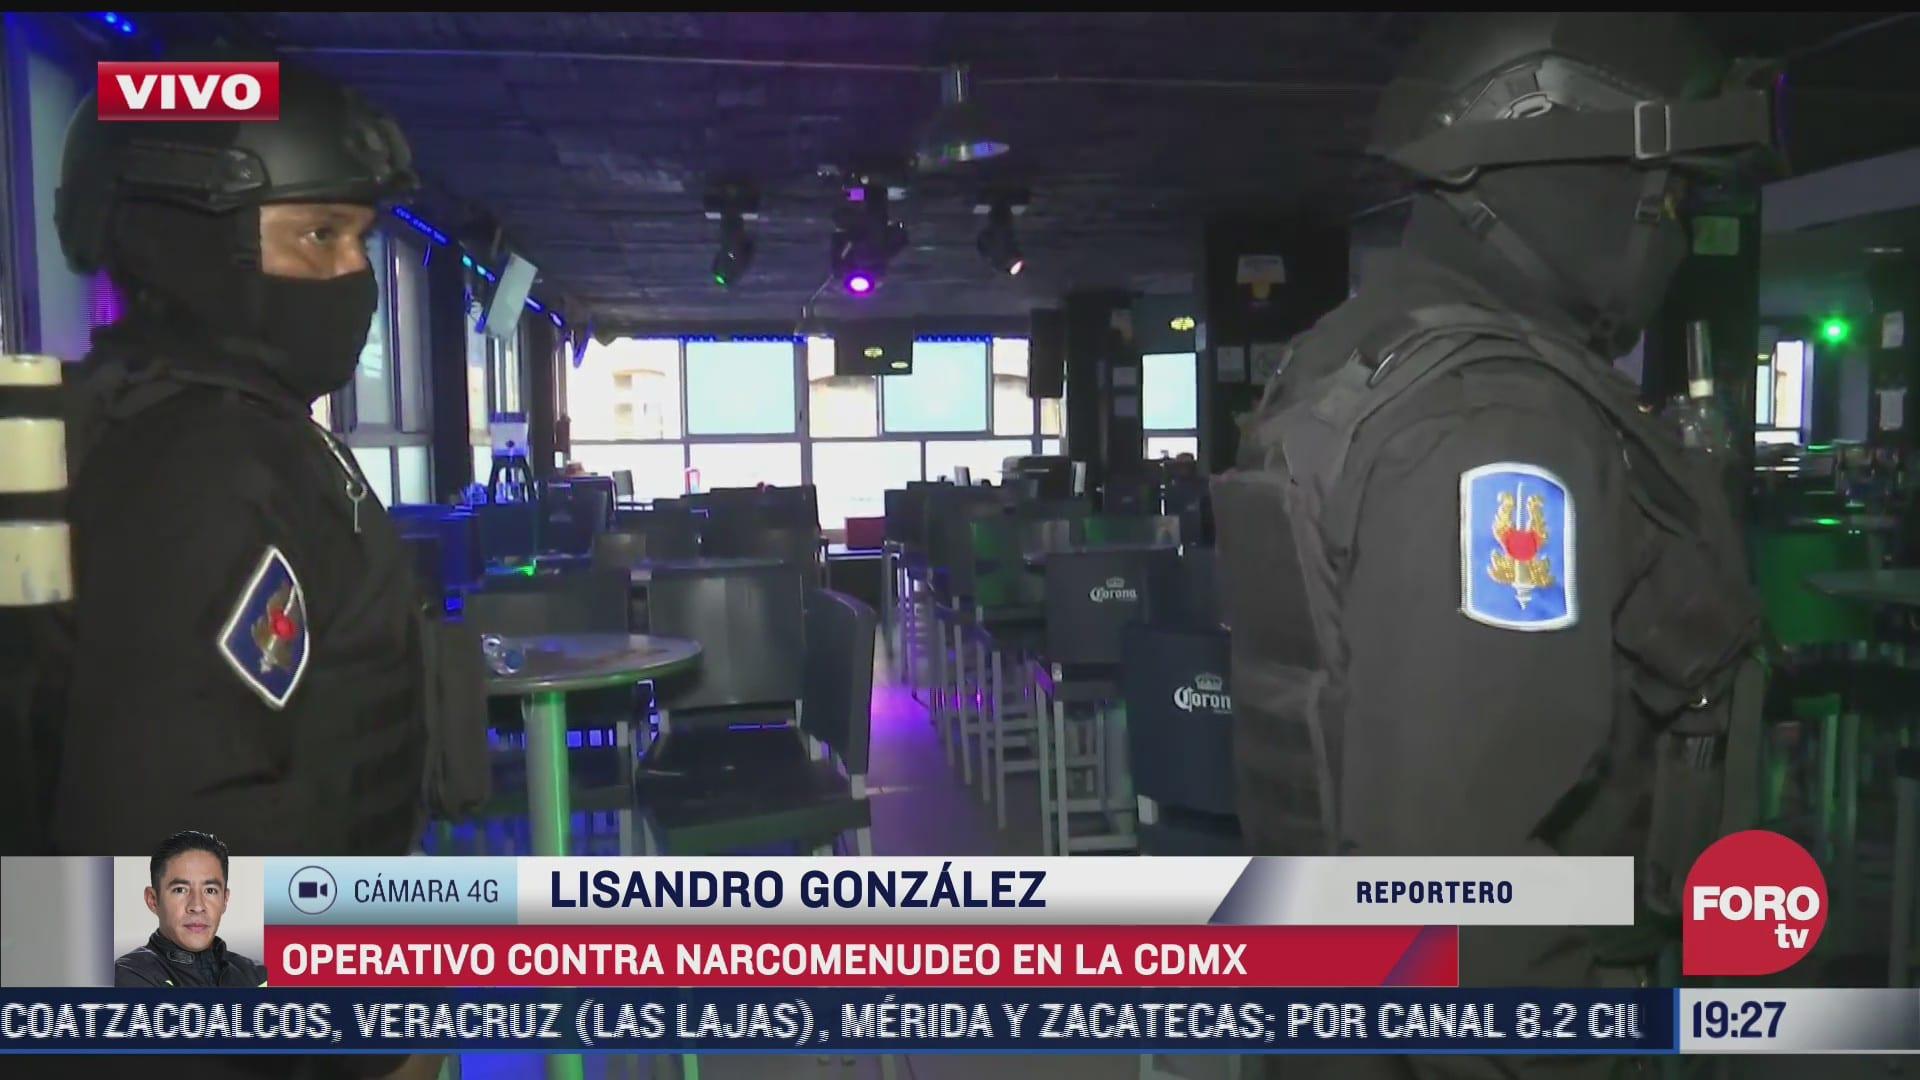 policia infiltrado en bar del centro de cdmx detecta narcomenudeo